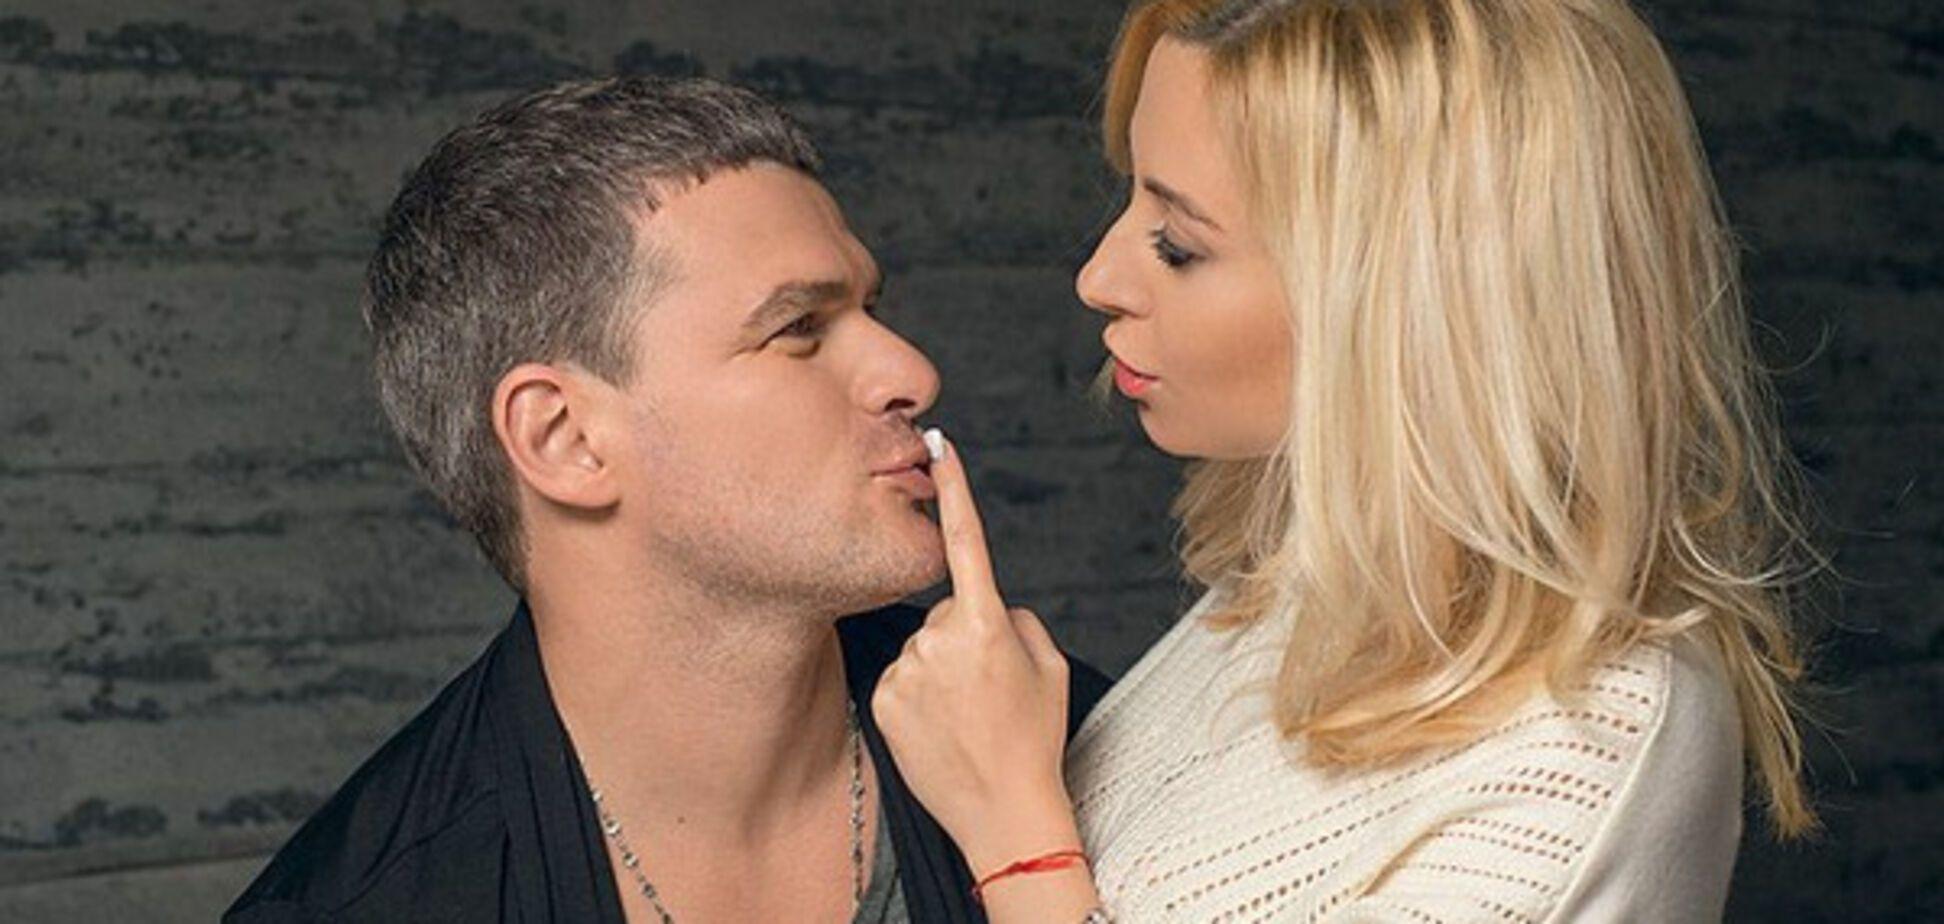 Тоня Матвиенко и Арсен Мирзоян похвастались снимками медового месяца